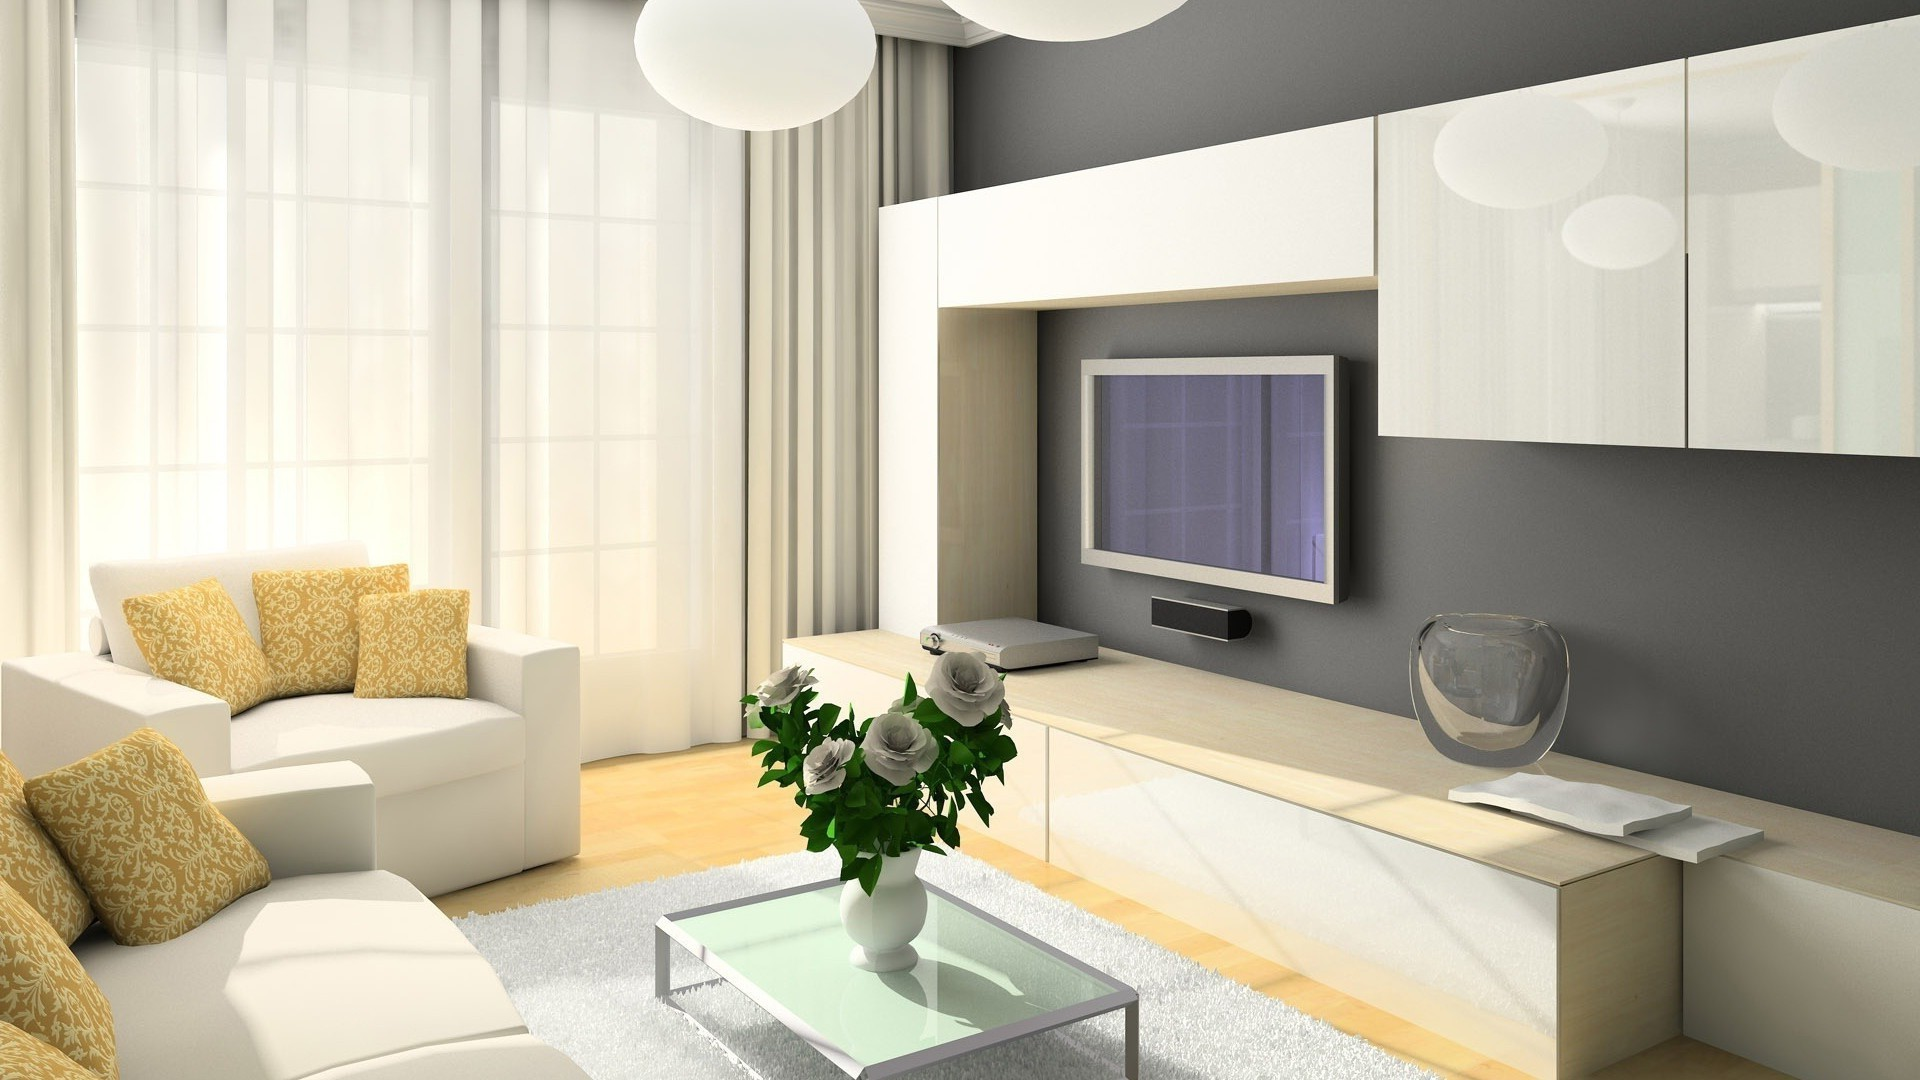 Дизайны комнаты 14 кв.м фото